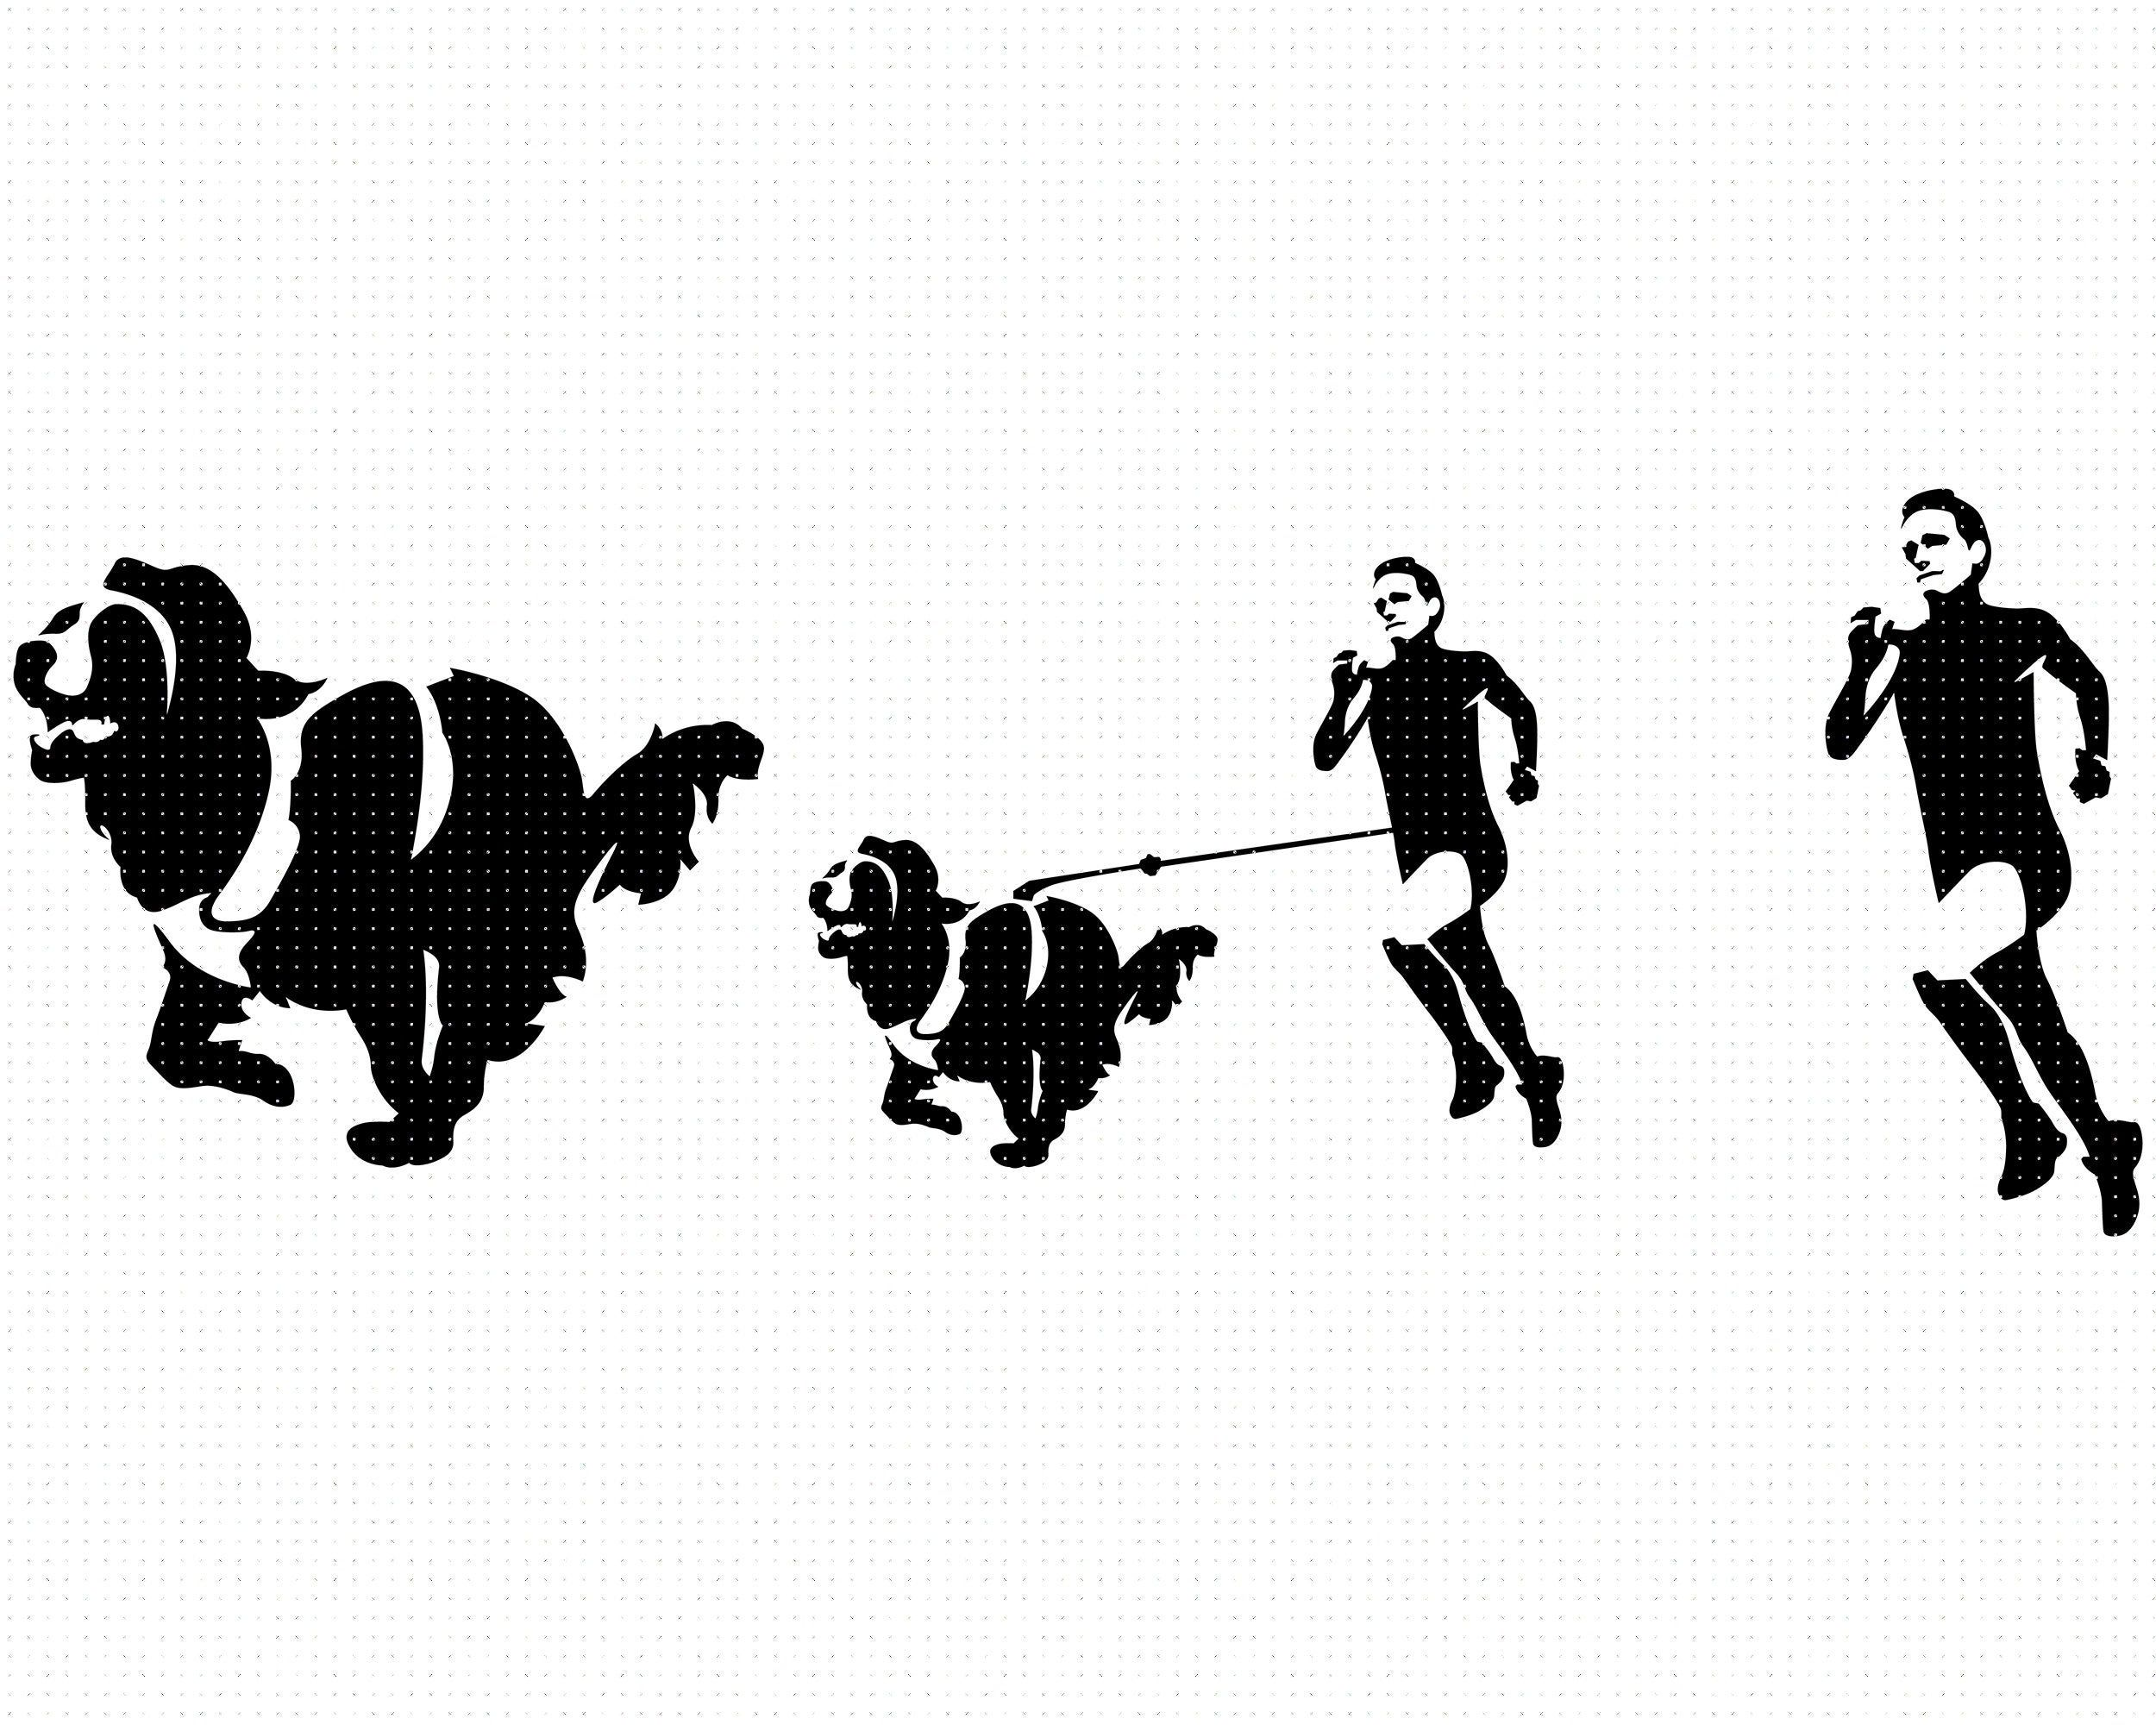 Canicross Svg Running Dog Svg Dog Sport Svg Dog Activity Etsy Sporting Dogs Dog Runs Dog Activities